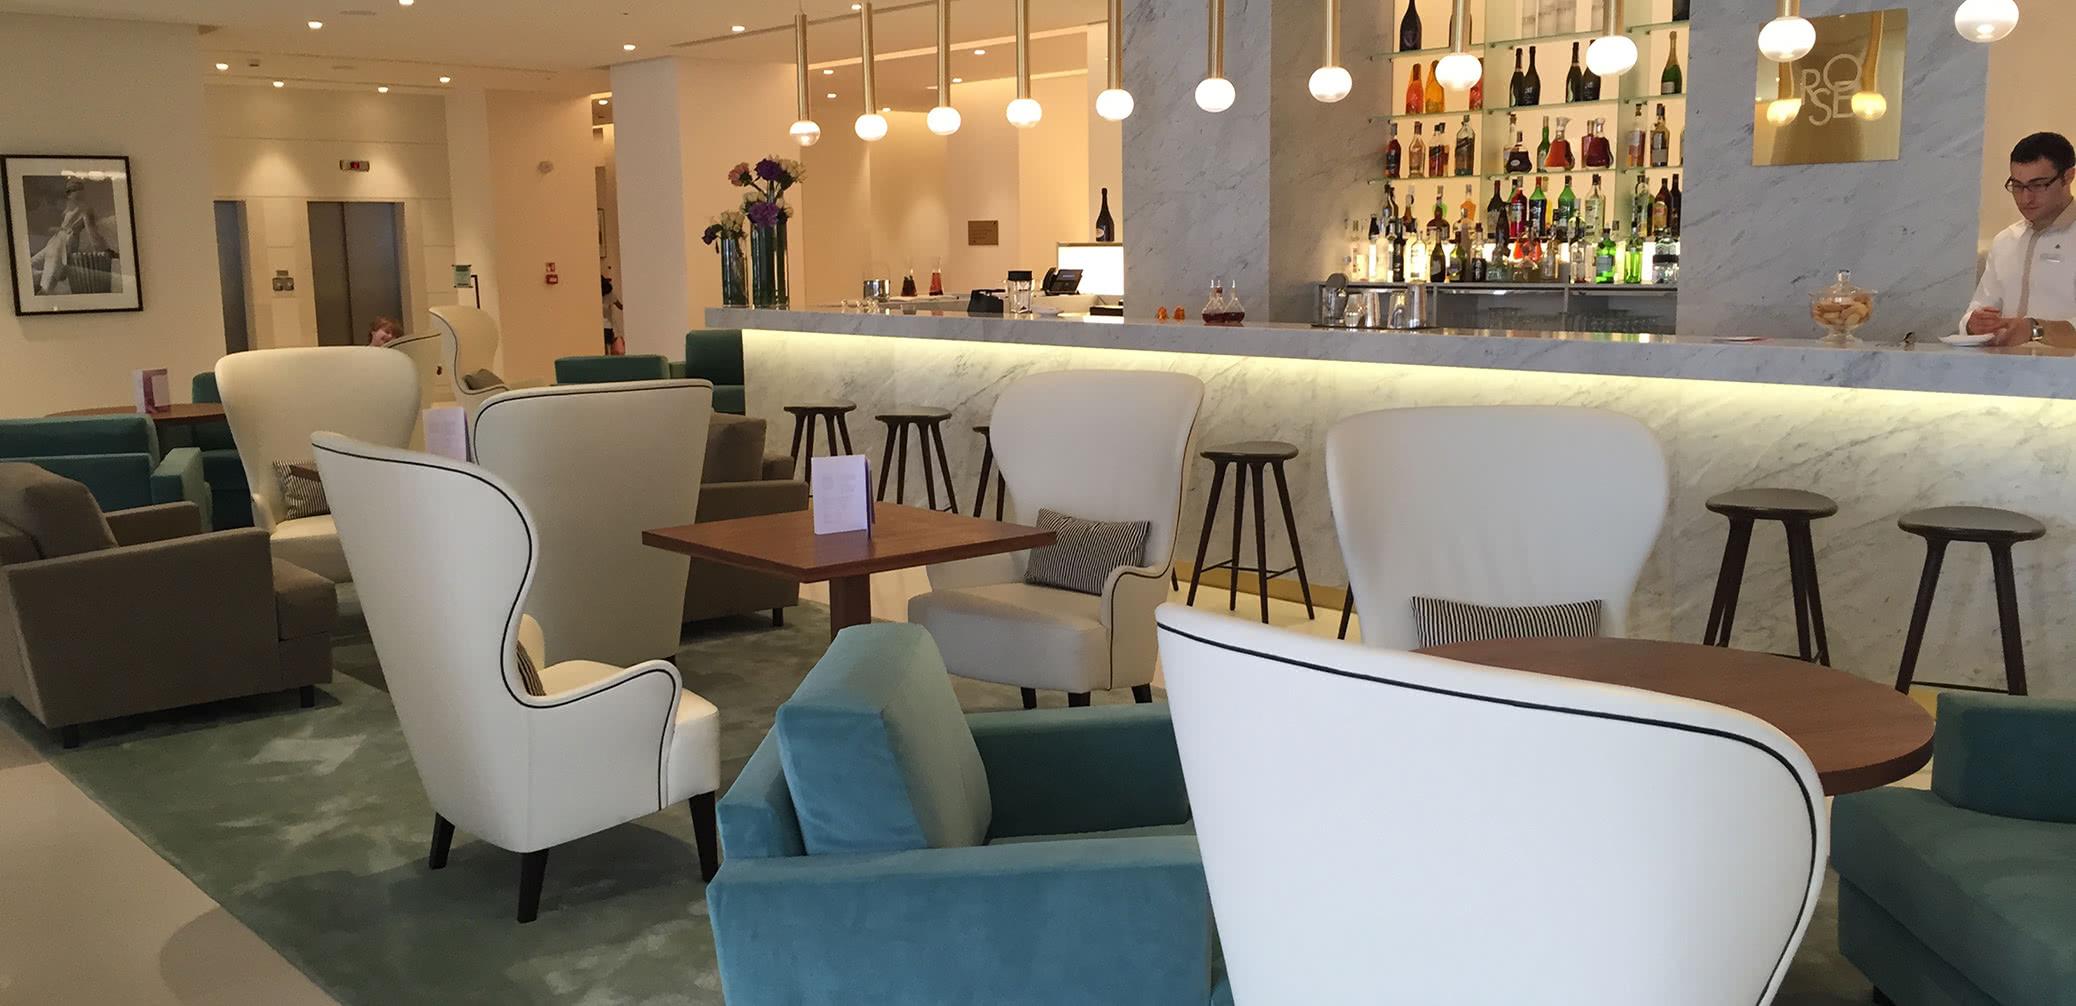 Best Hotel Club Lounge In Salt Lake City